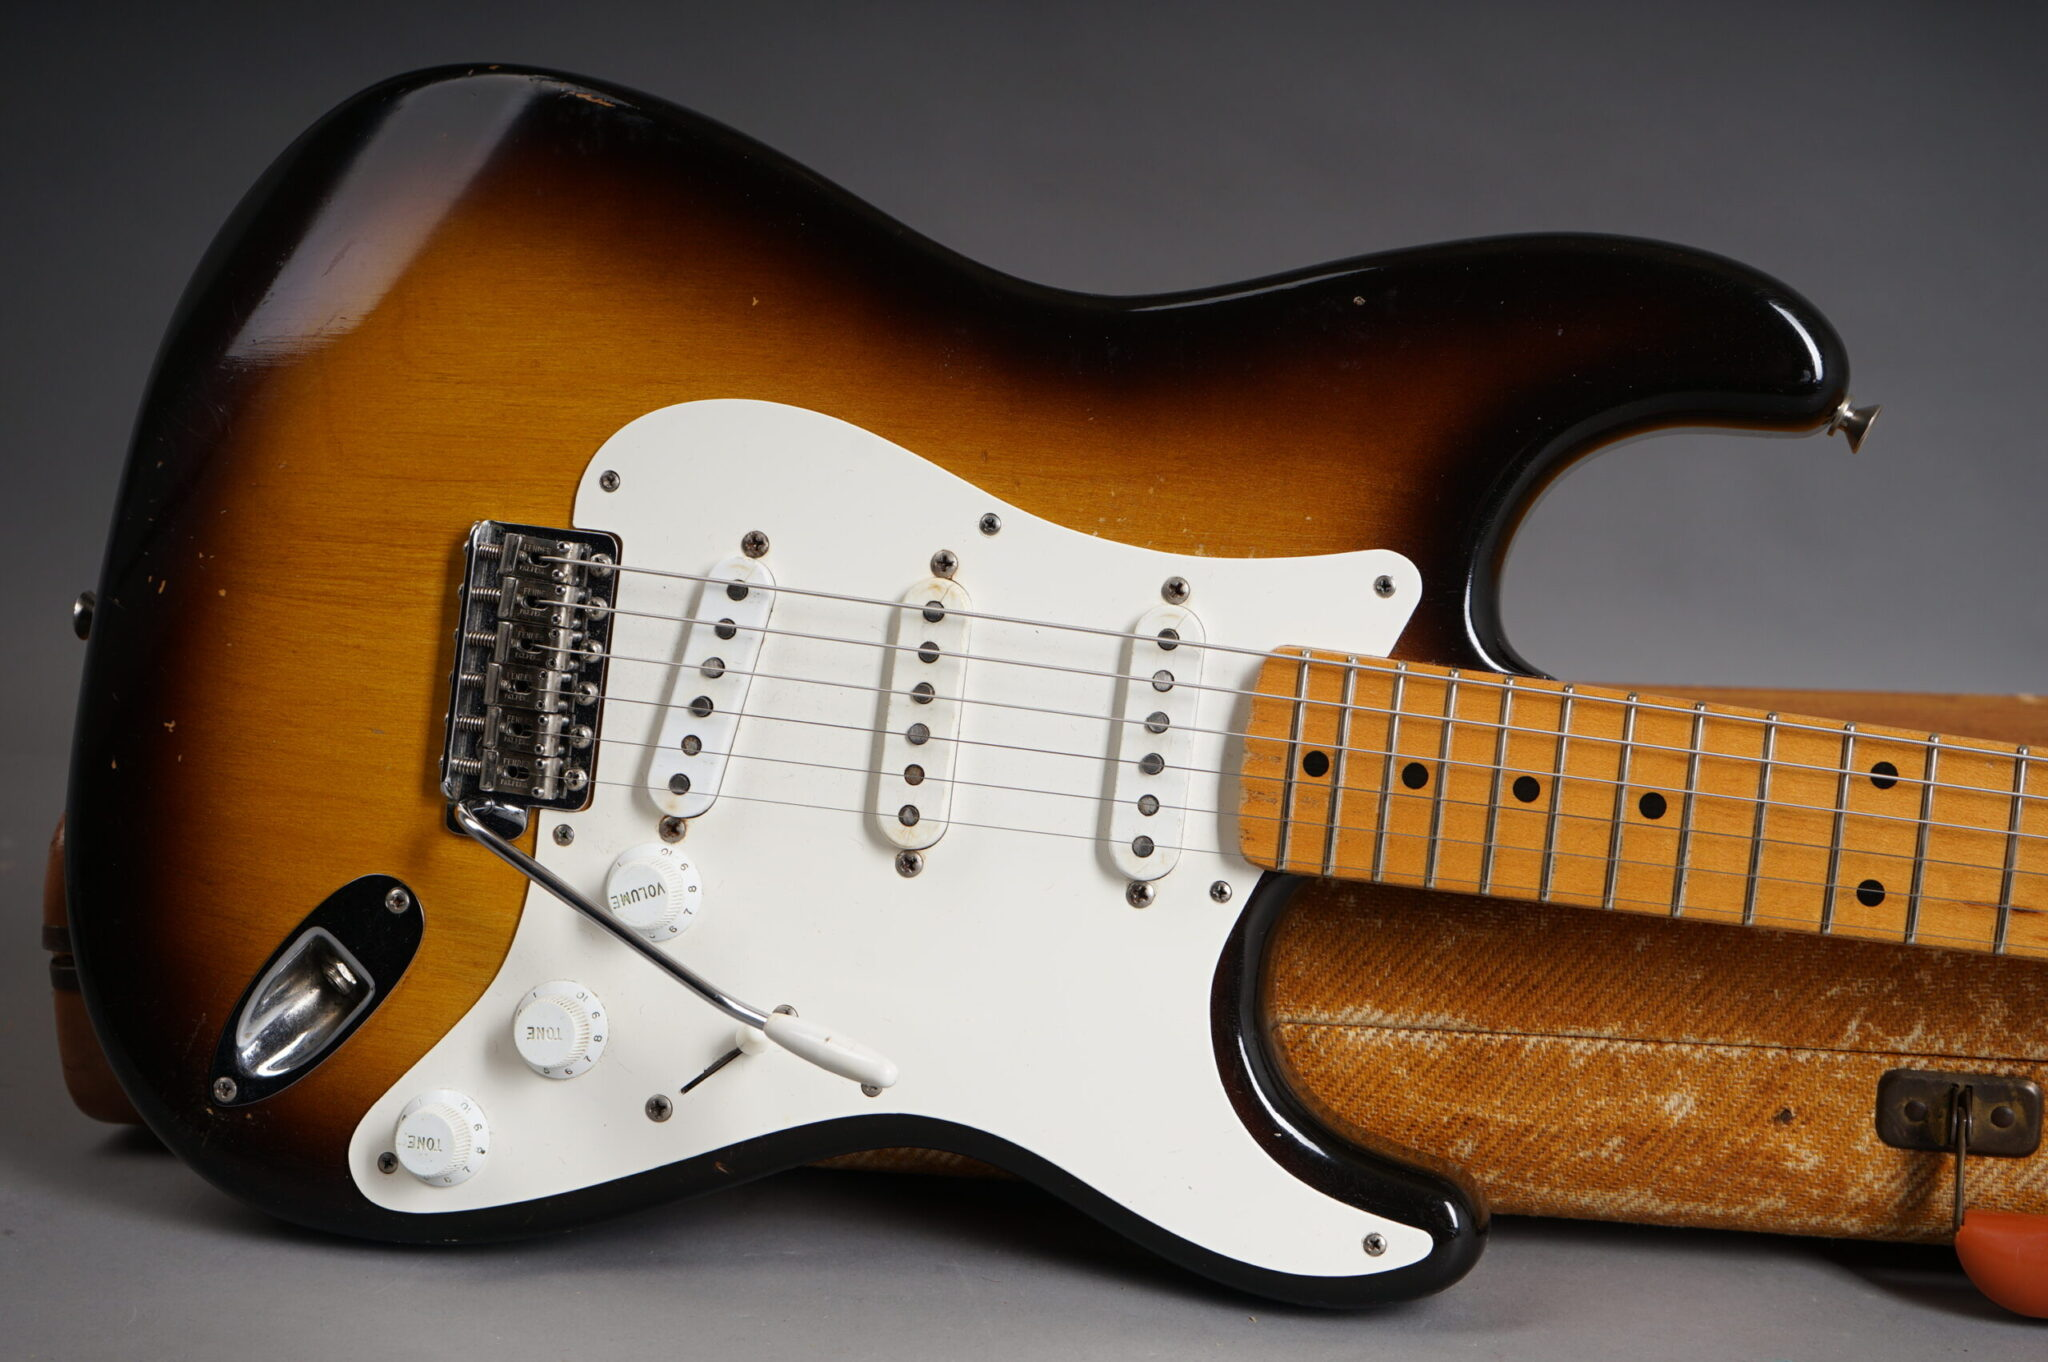 https://guitarpoint.de/app/uploads/products/1956-fender-stratocaster-2-tone-sunburst-5/1956-Fender-Stratocaster-Sunburst-14567-11-scaled-2048x1362.jpg